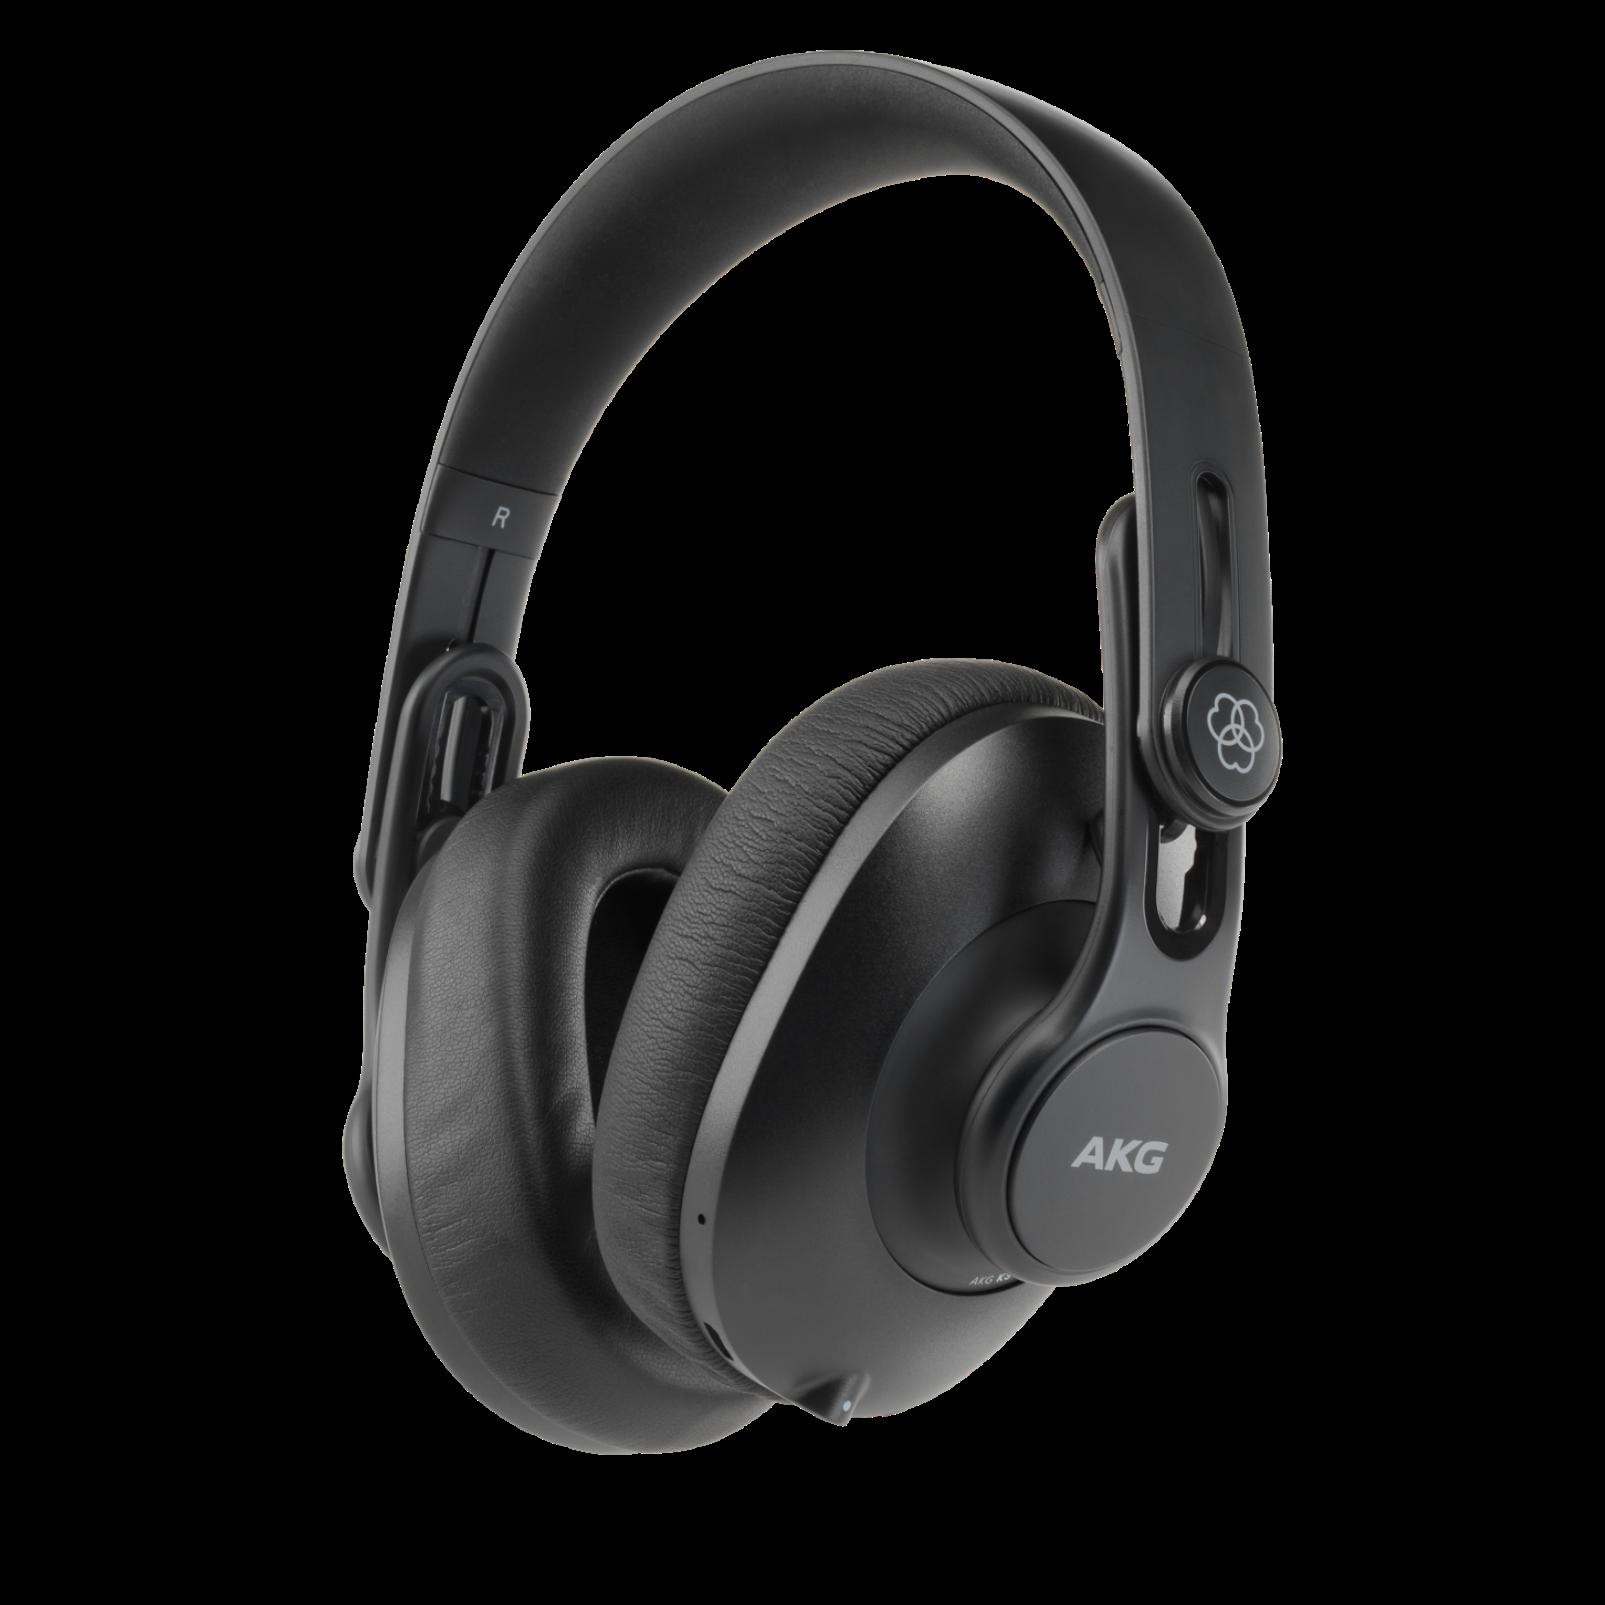 K361-BT - Black - Over-ear, closed-back, foldable studio headphones with Bluetooth - Hero